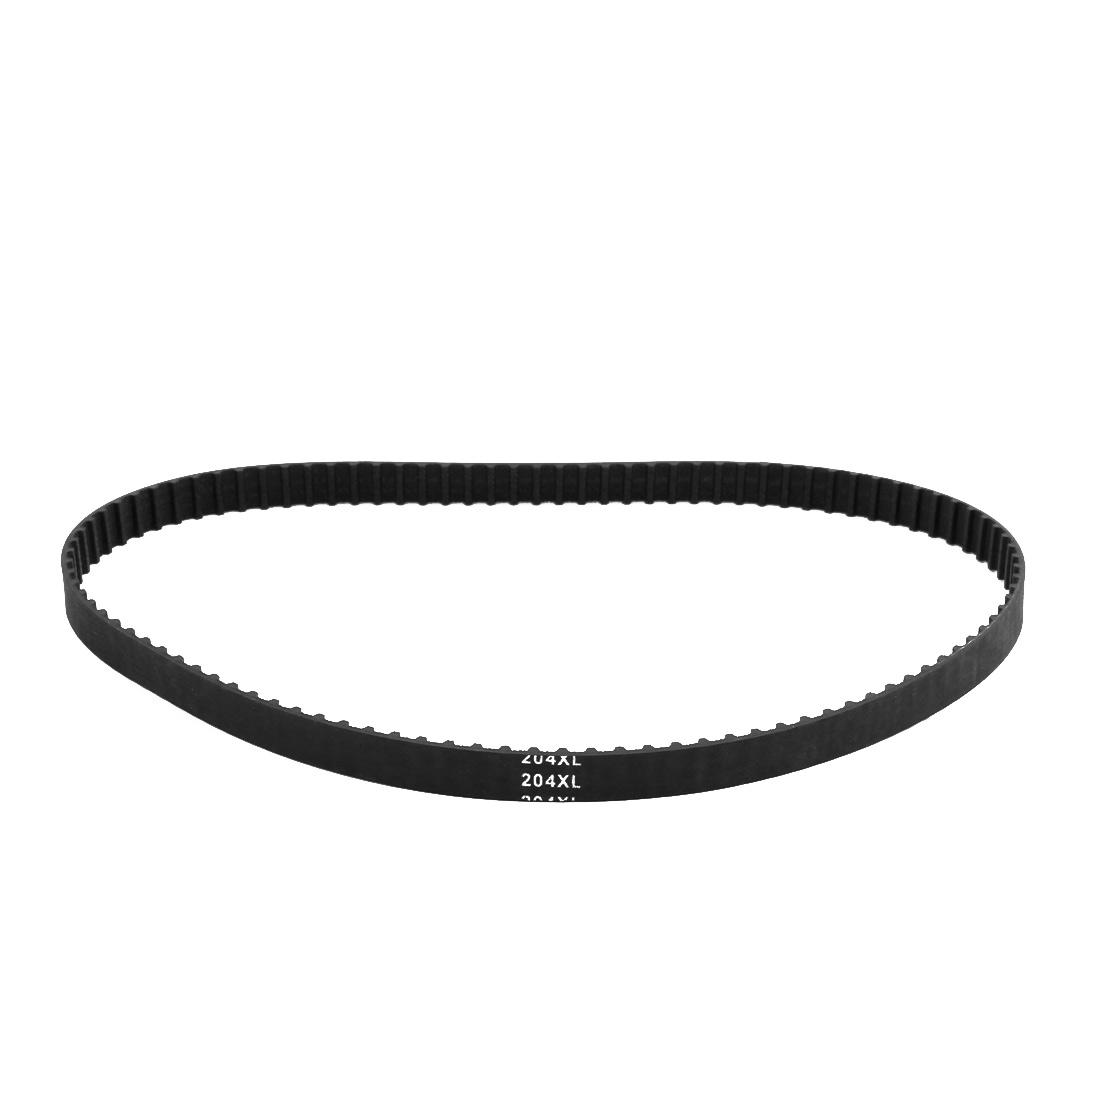 204XL 102 Teeth 10mm Width 5.08mm Pitch Stepper Motor Rubber Timing Belt Black